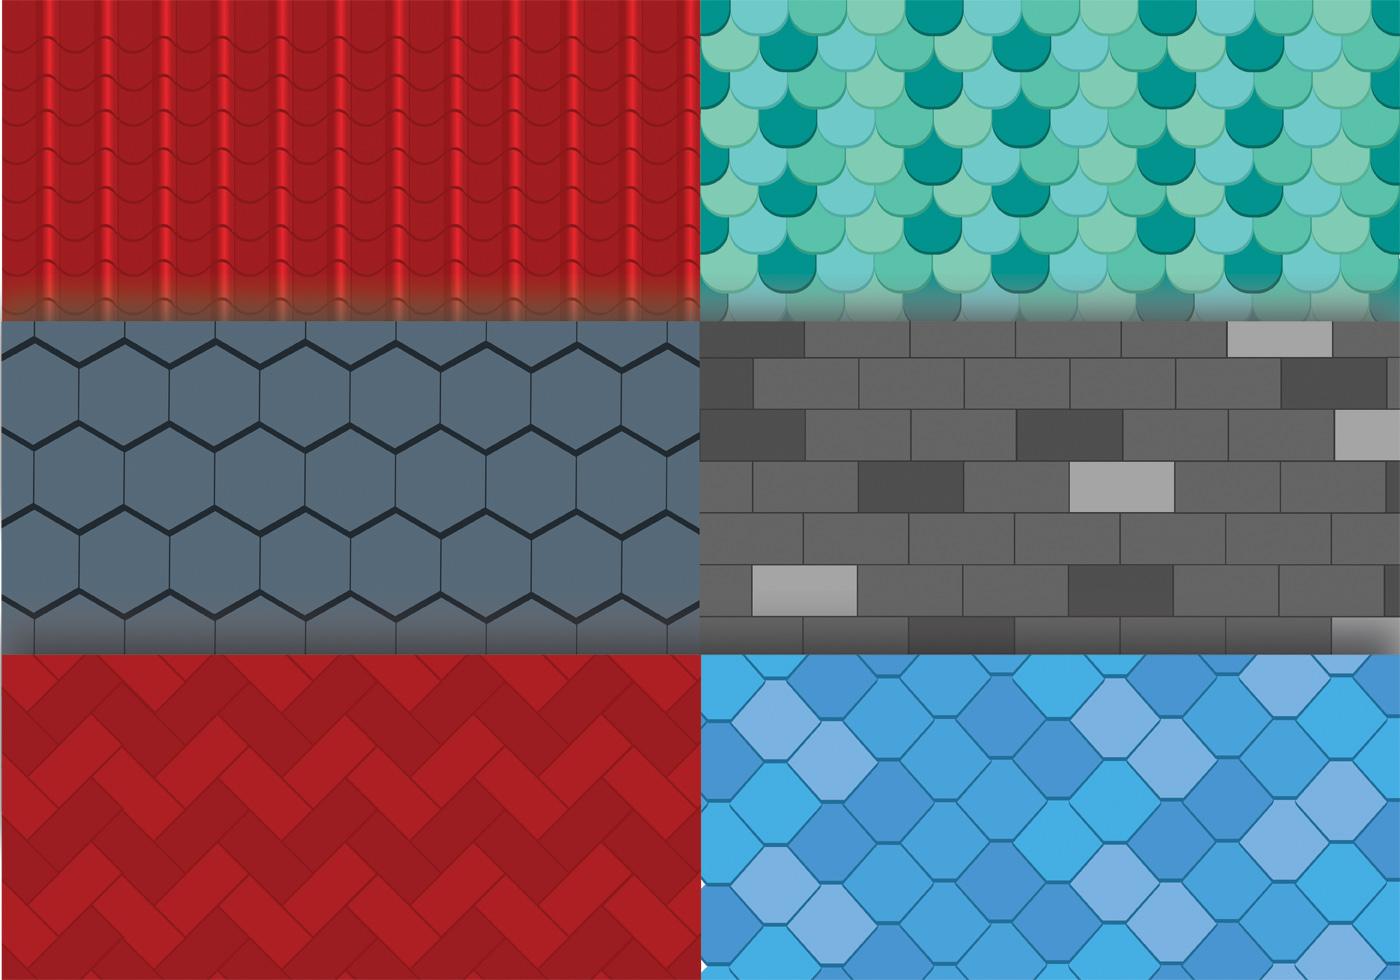 Roof Tile Texture Vector Pack Download Free Vector Art